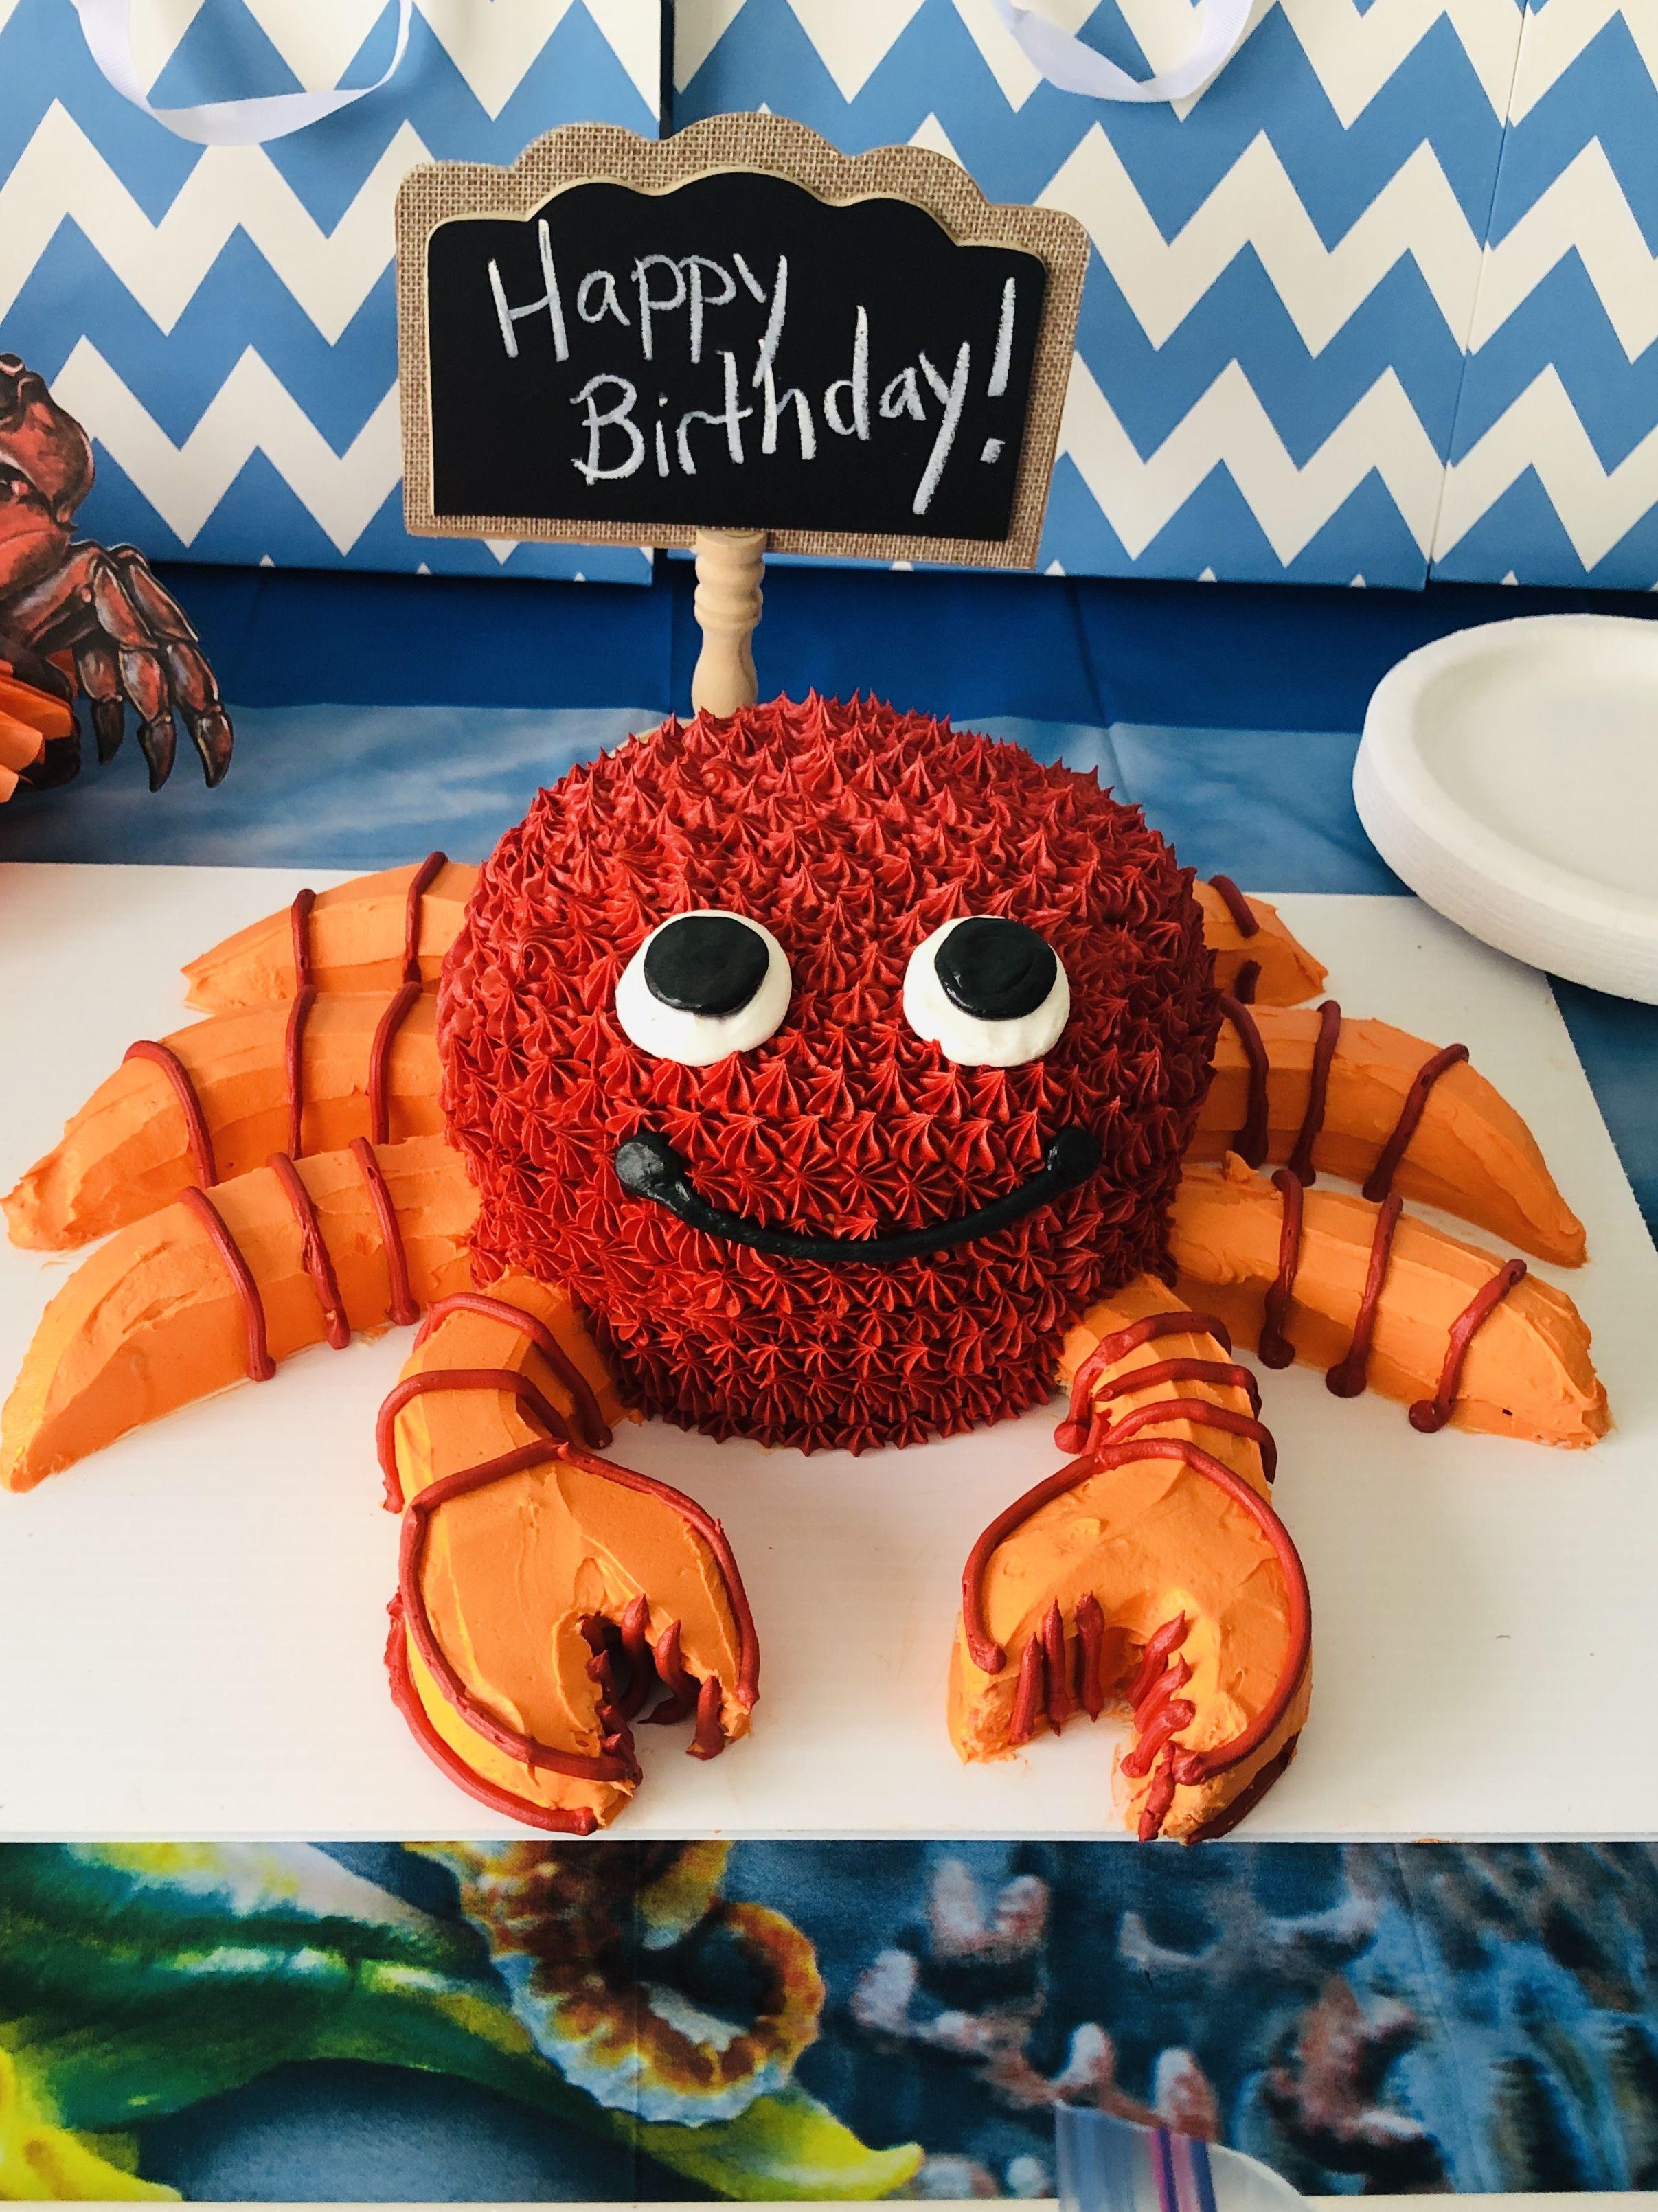 Peachy Crab Birthday Cake With Images Crab Birthday Cakes Crab Party Funny Birthday Cards Online Necthendildamsfinfo